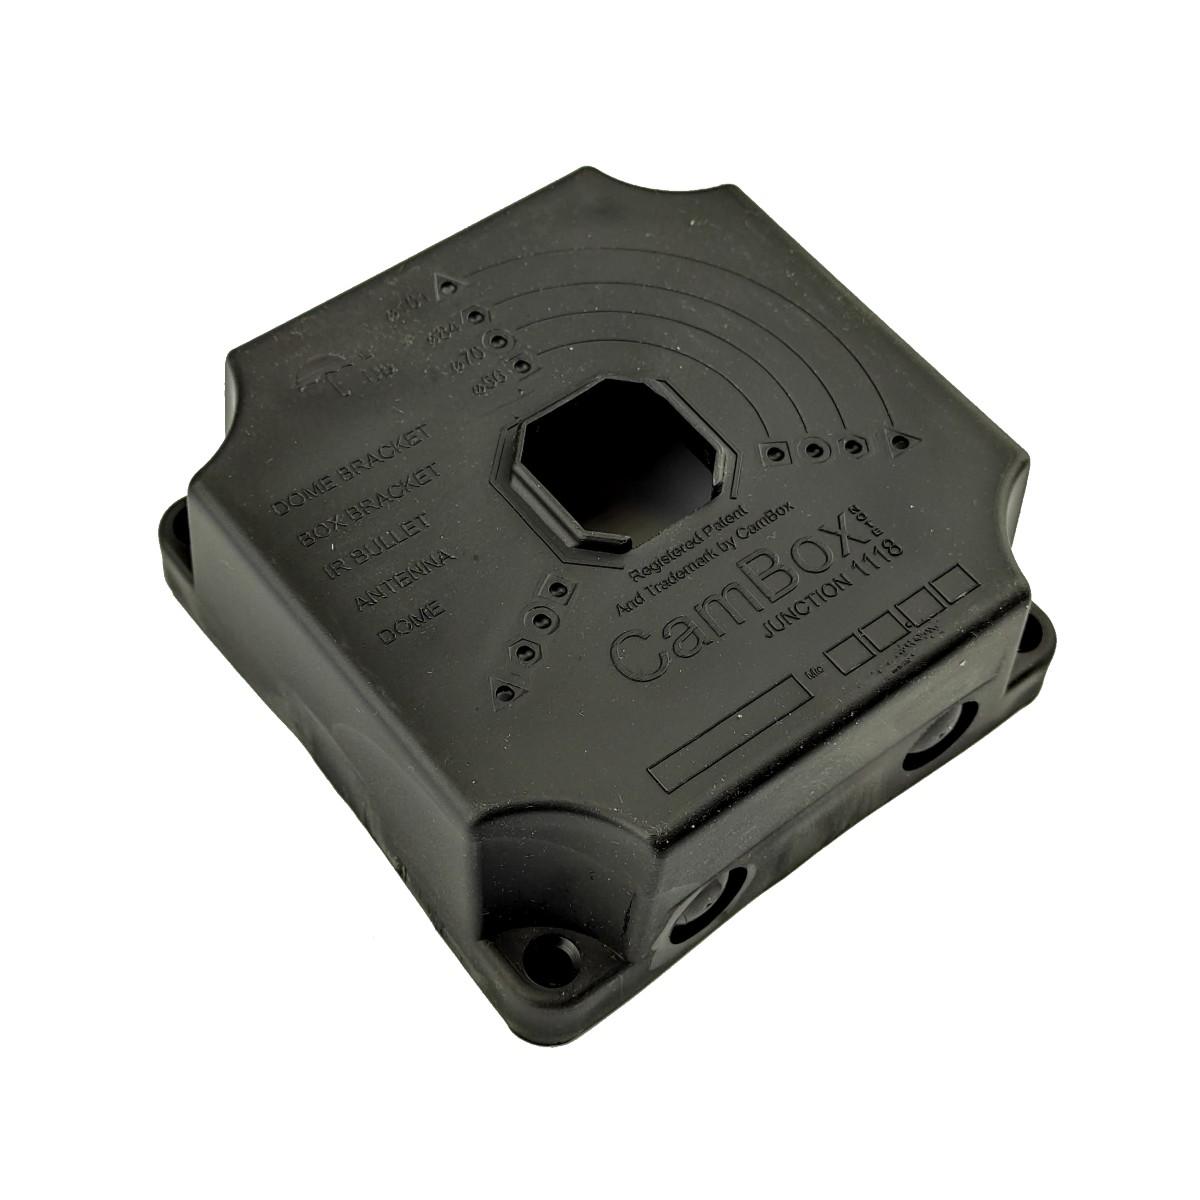 CamBox NX1-1118 Blk